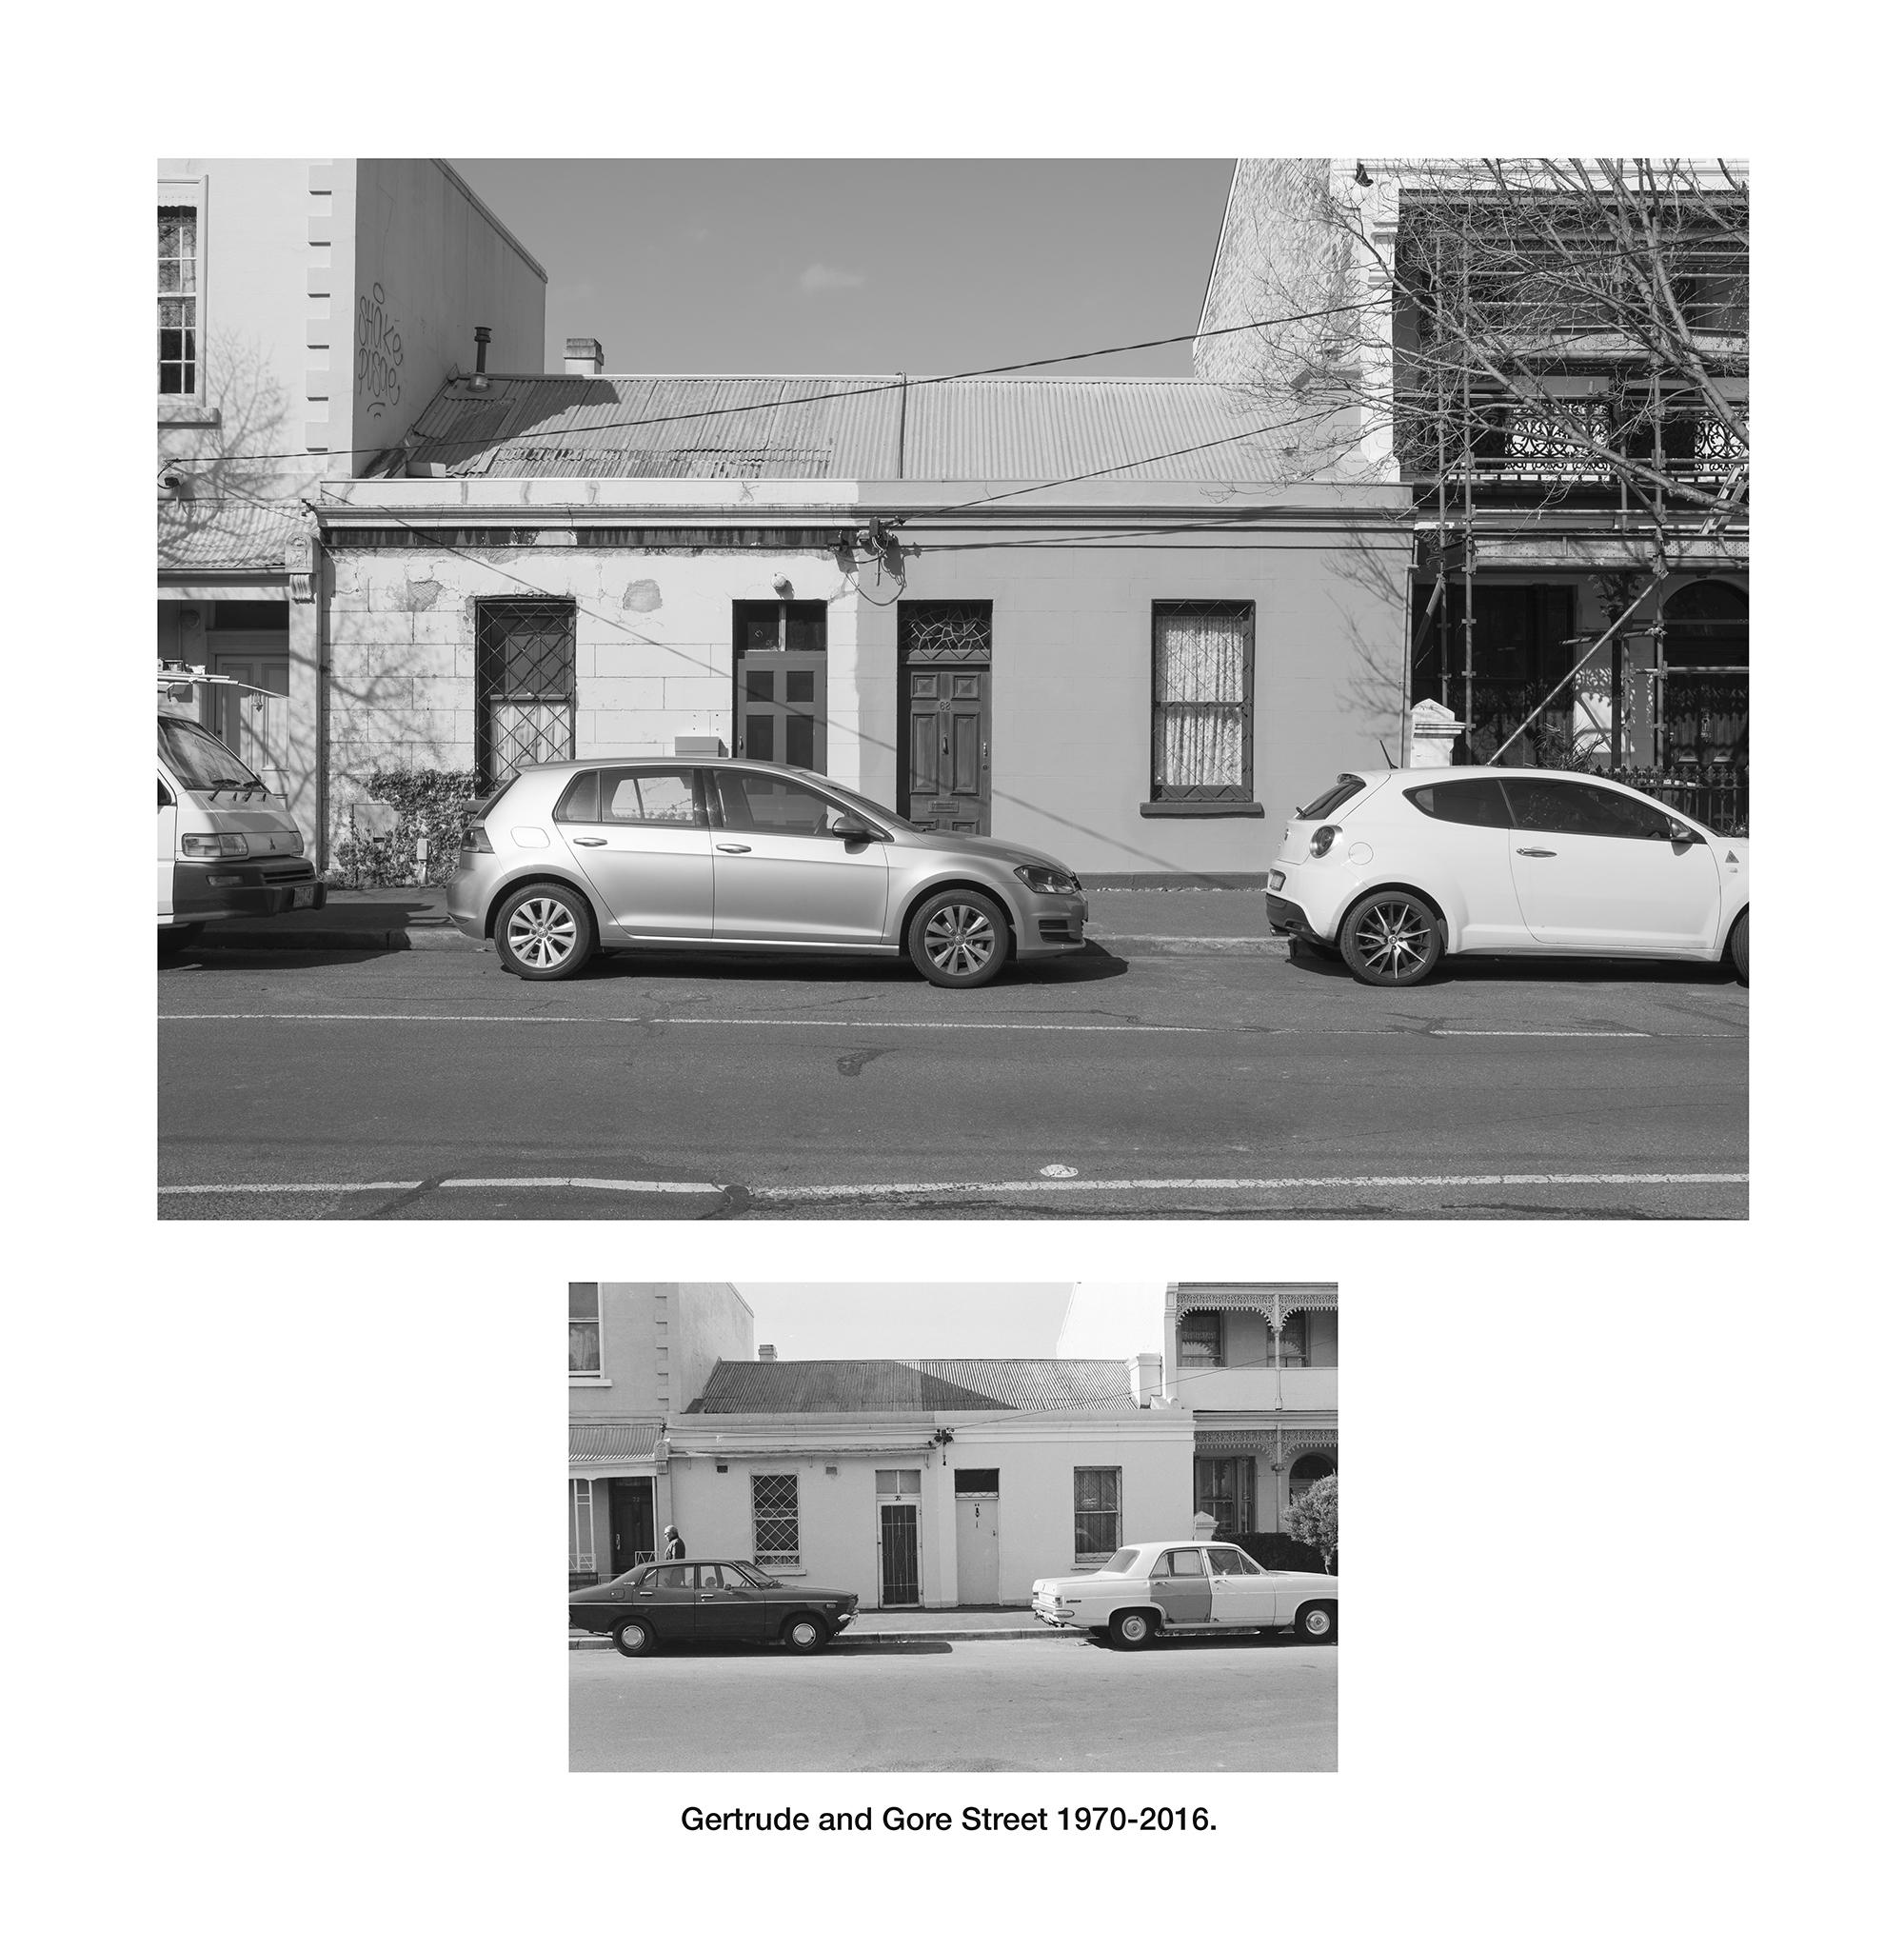 Gertrude Street & Gores Street, Fitzroy 1970 - 2016